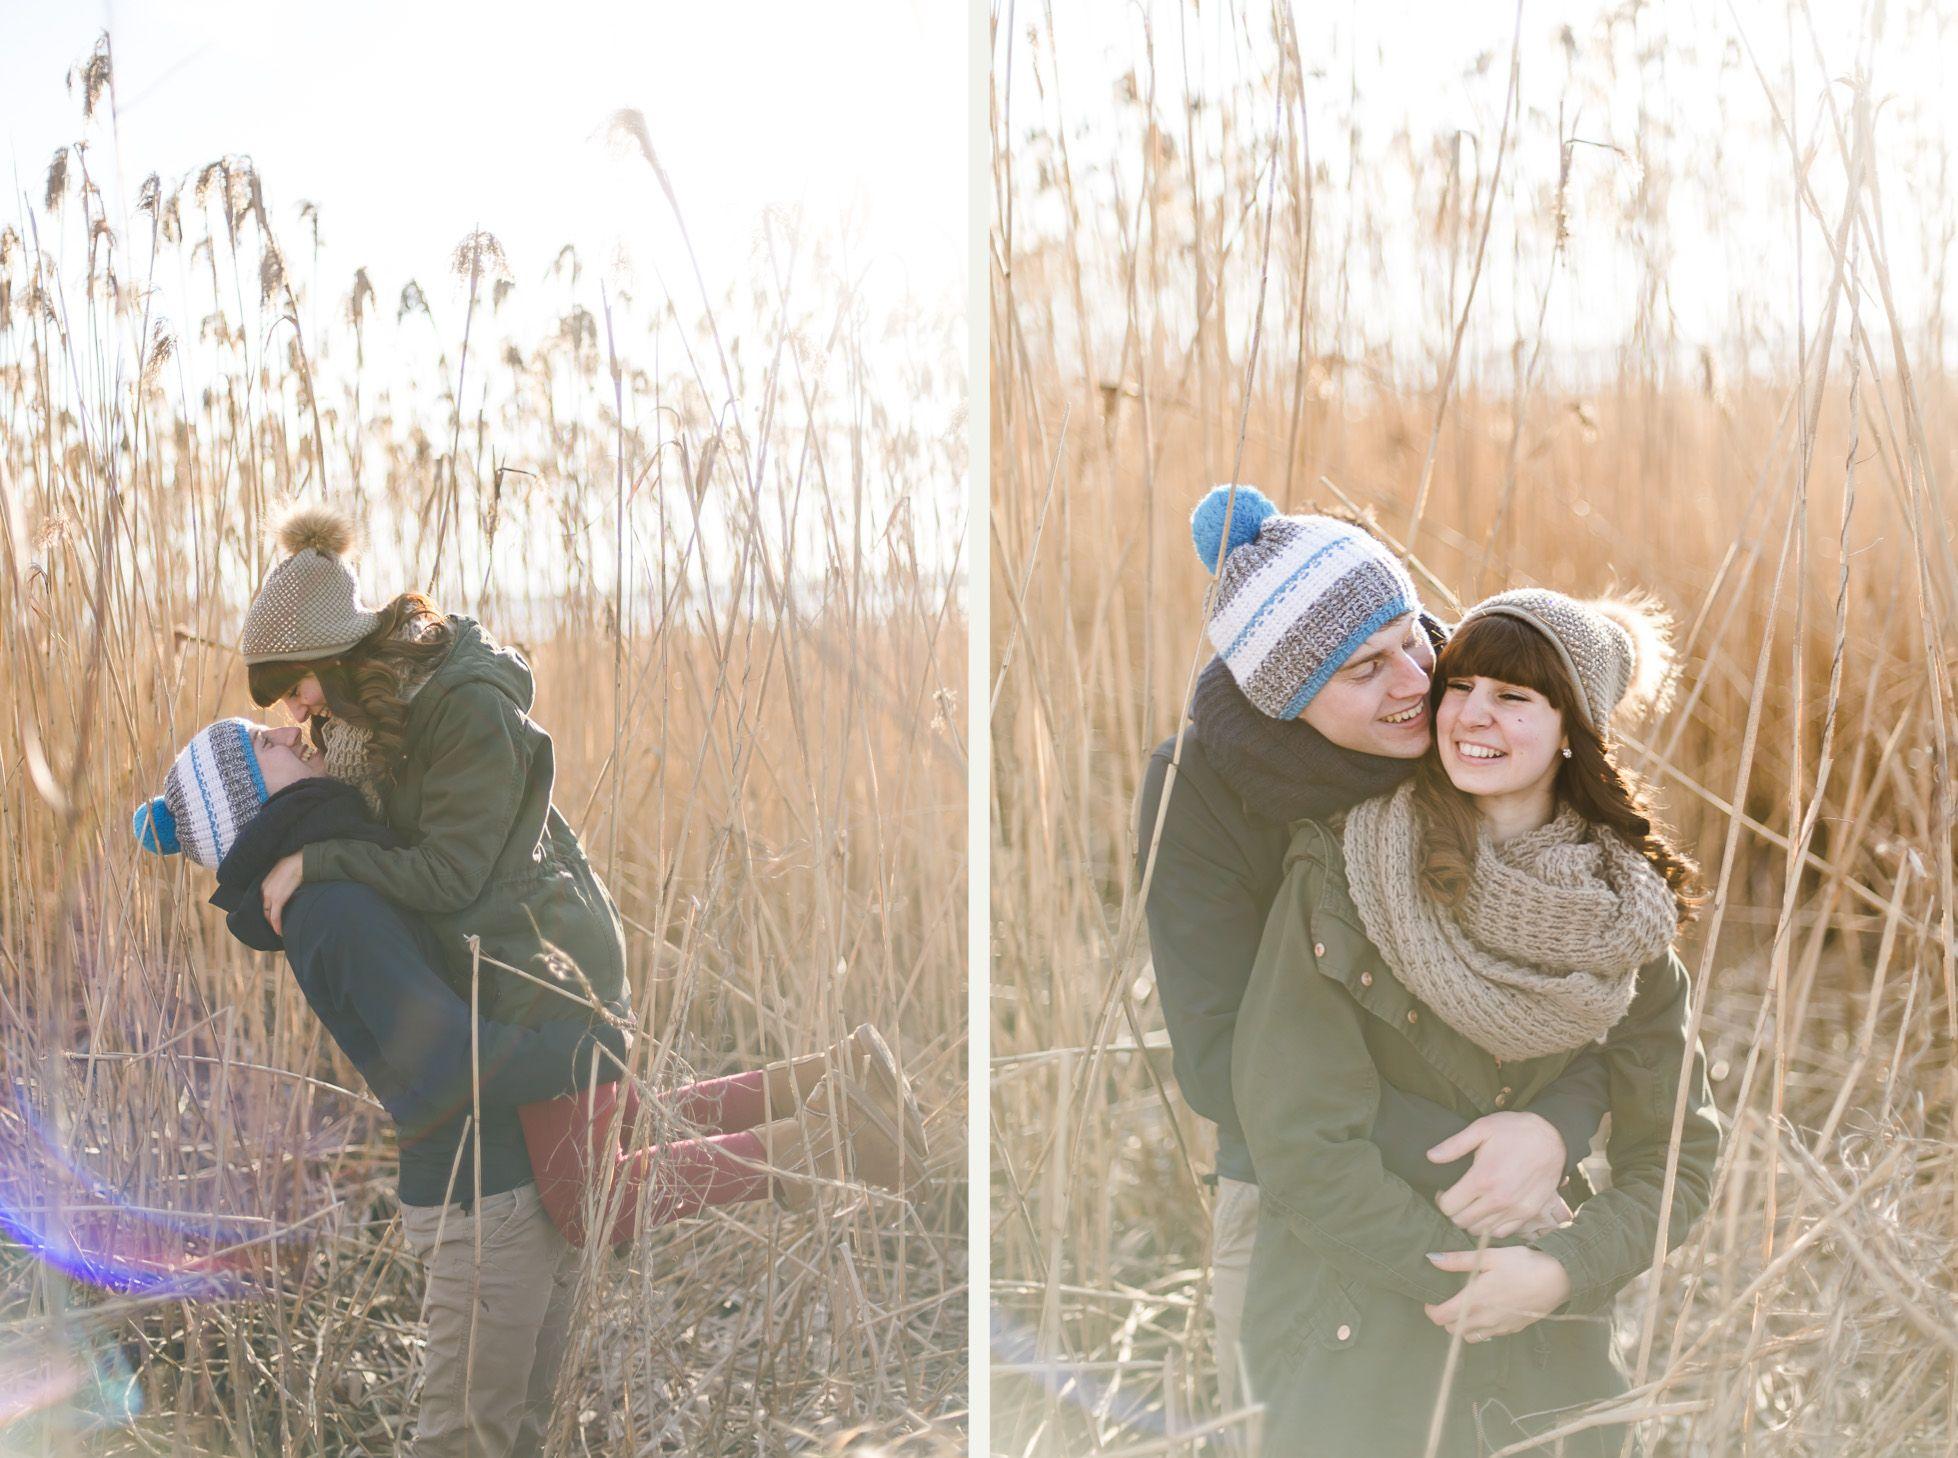 lichtm dchen fotografie p rchen couple portrait paarshooting in love verliebt see lake. Black Bedroom Furniture Sets. Home Design Ideas